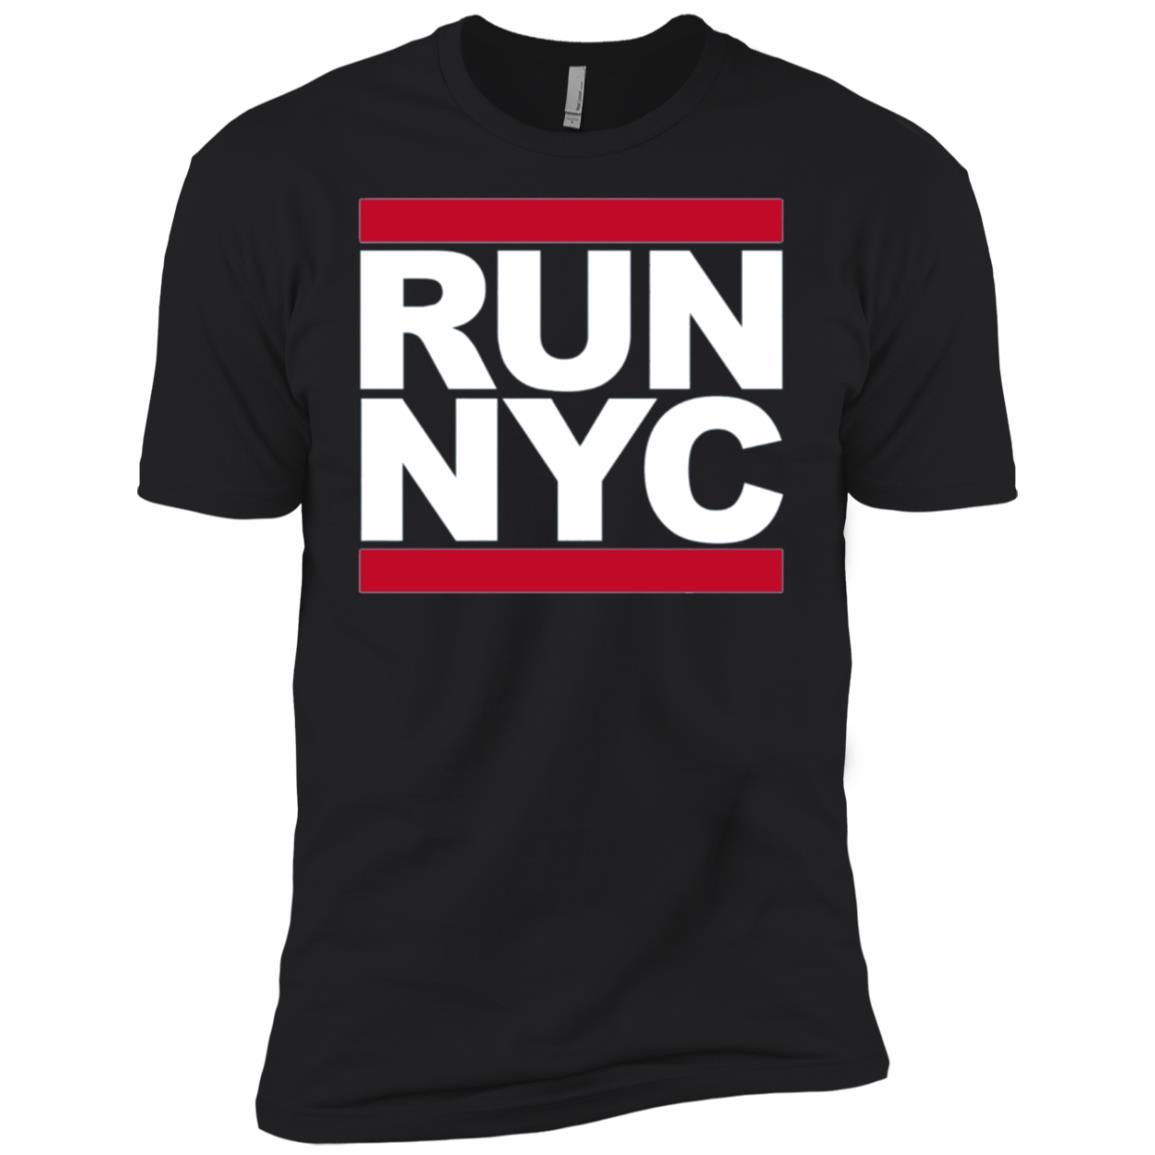 Run NYC – New York City Running for Runners Men Short Sleeve T-Shirt